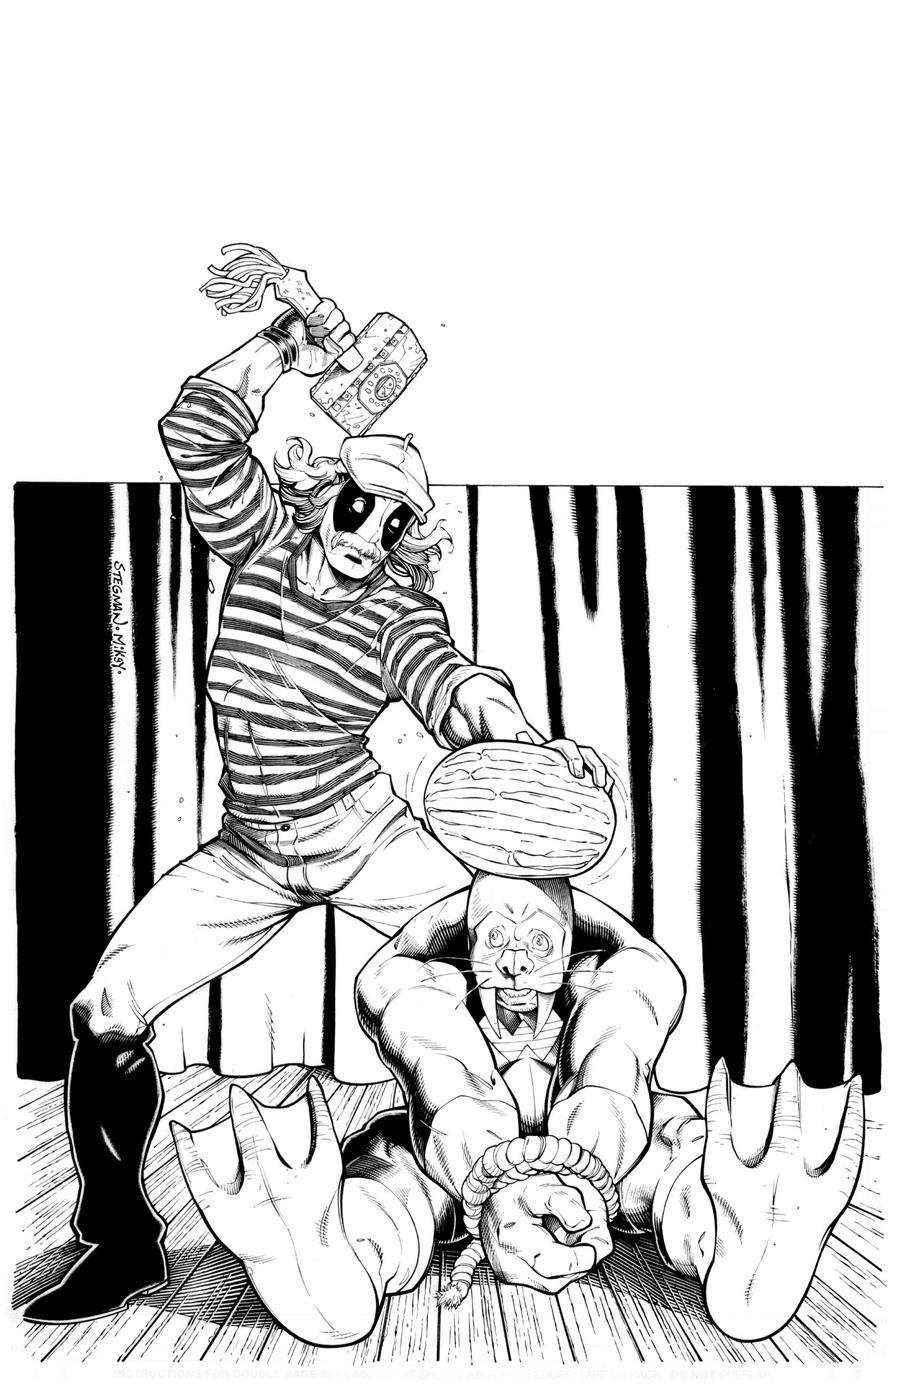 Deadpool Fear Itself cover 2 by Frisbeegod